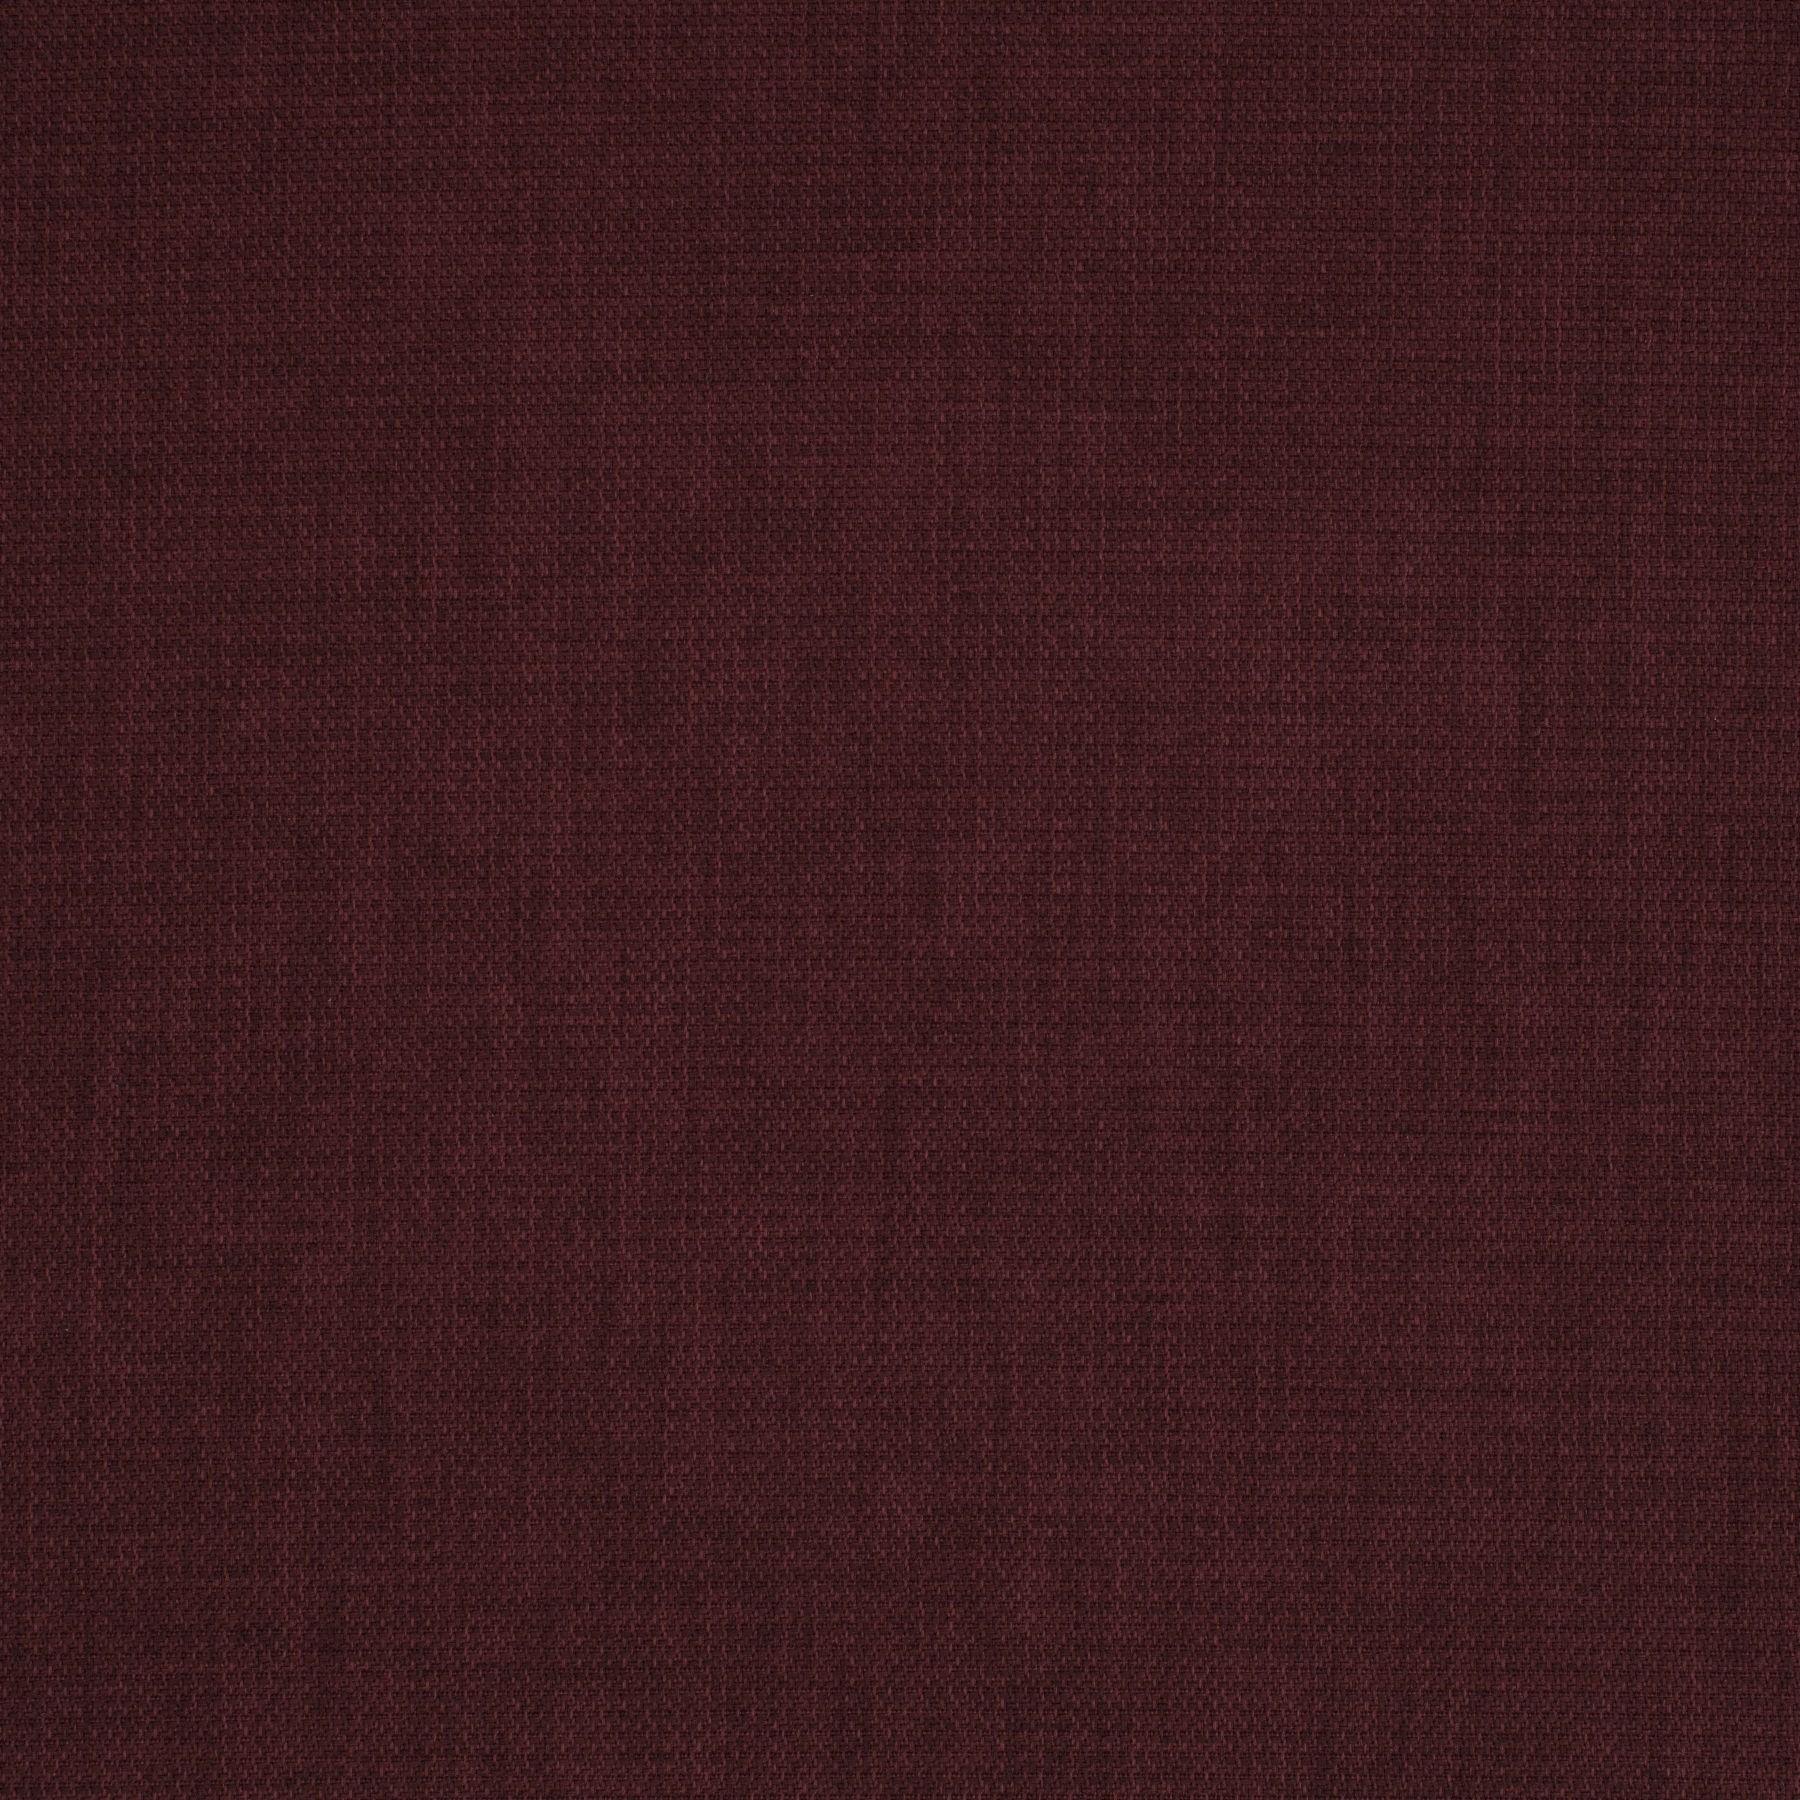 upholstery fabric vito vol 2 1 1309 015 jab anstoetz. Black Bedroom Furniture Sets. Home Design Ideas